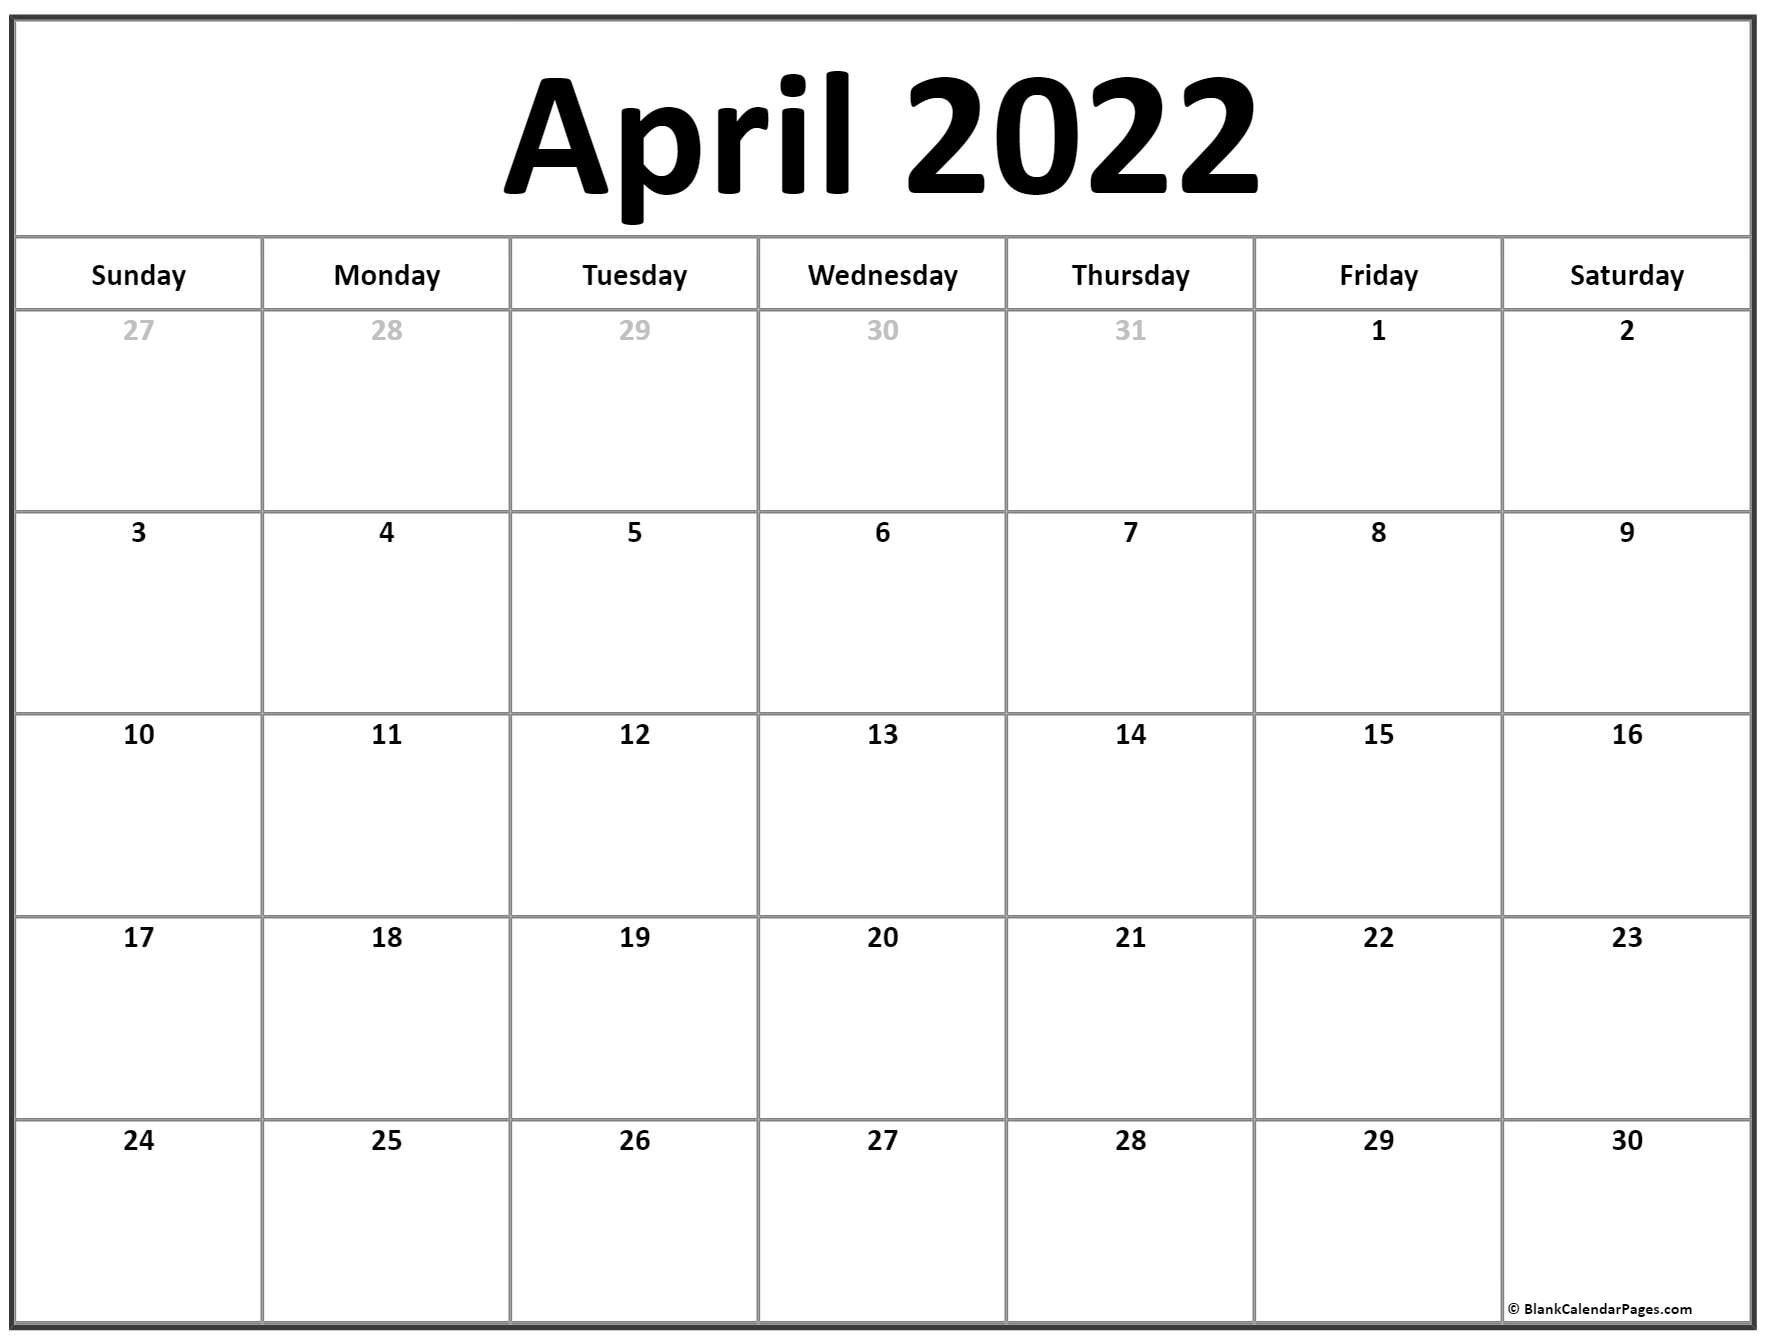 April 2022 Calendar   Free Printable Calendar Templates regarding April May 2022 Printable Calendar